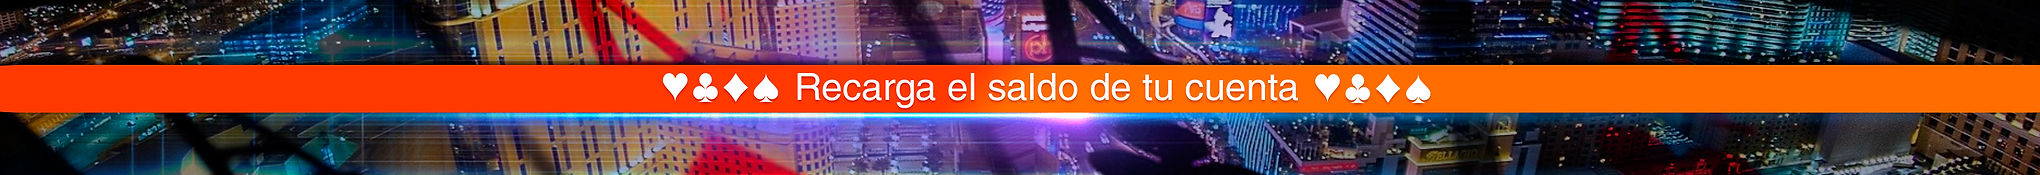 banner-monedas1.jpg